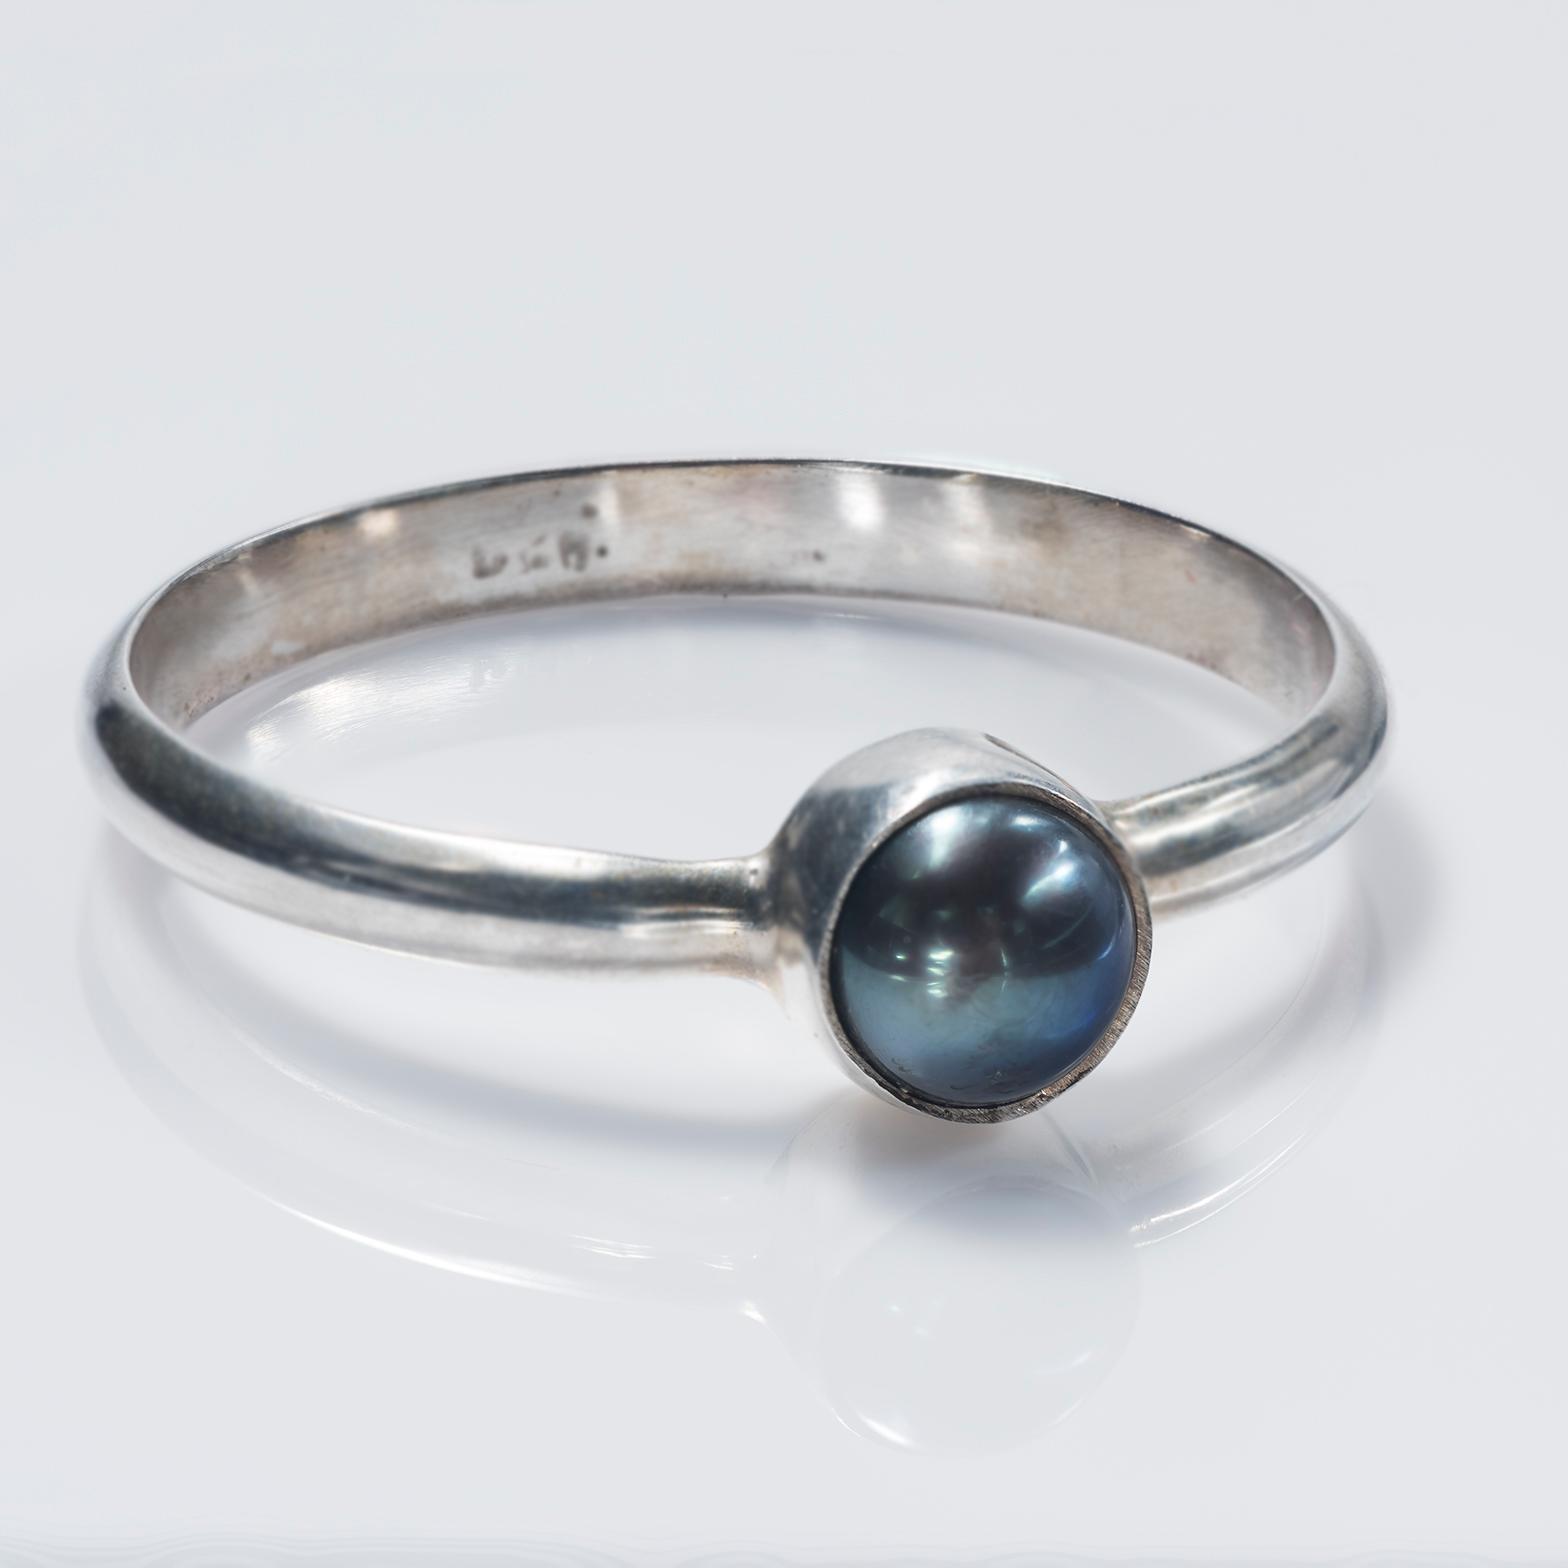 Single Gray-Black Pearl Ring